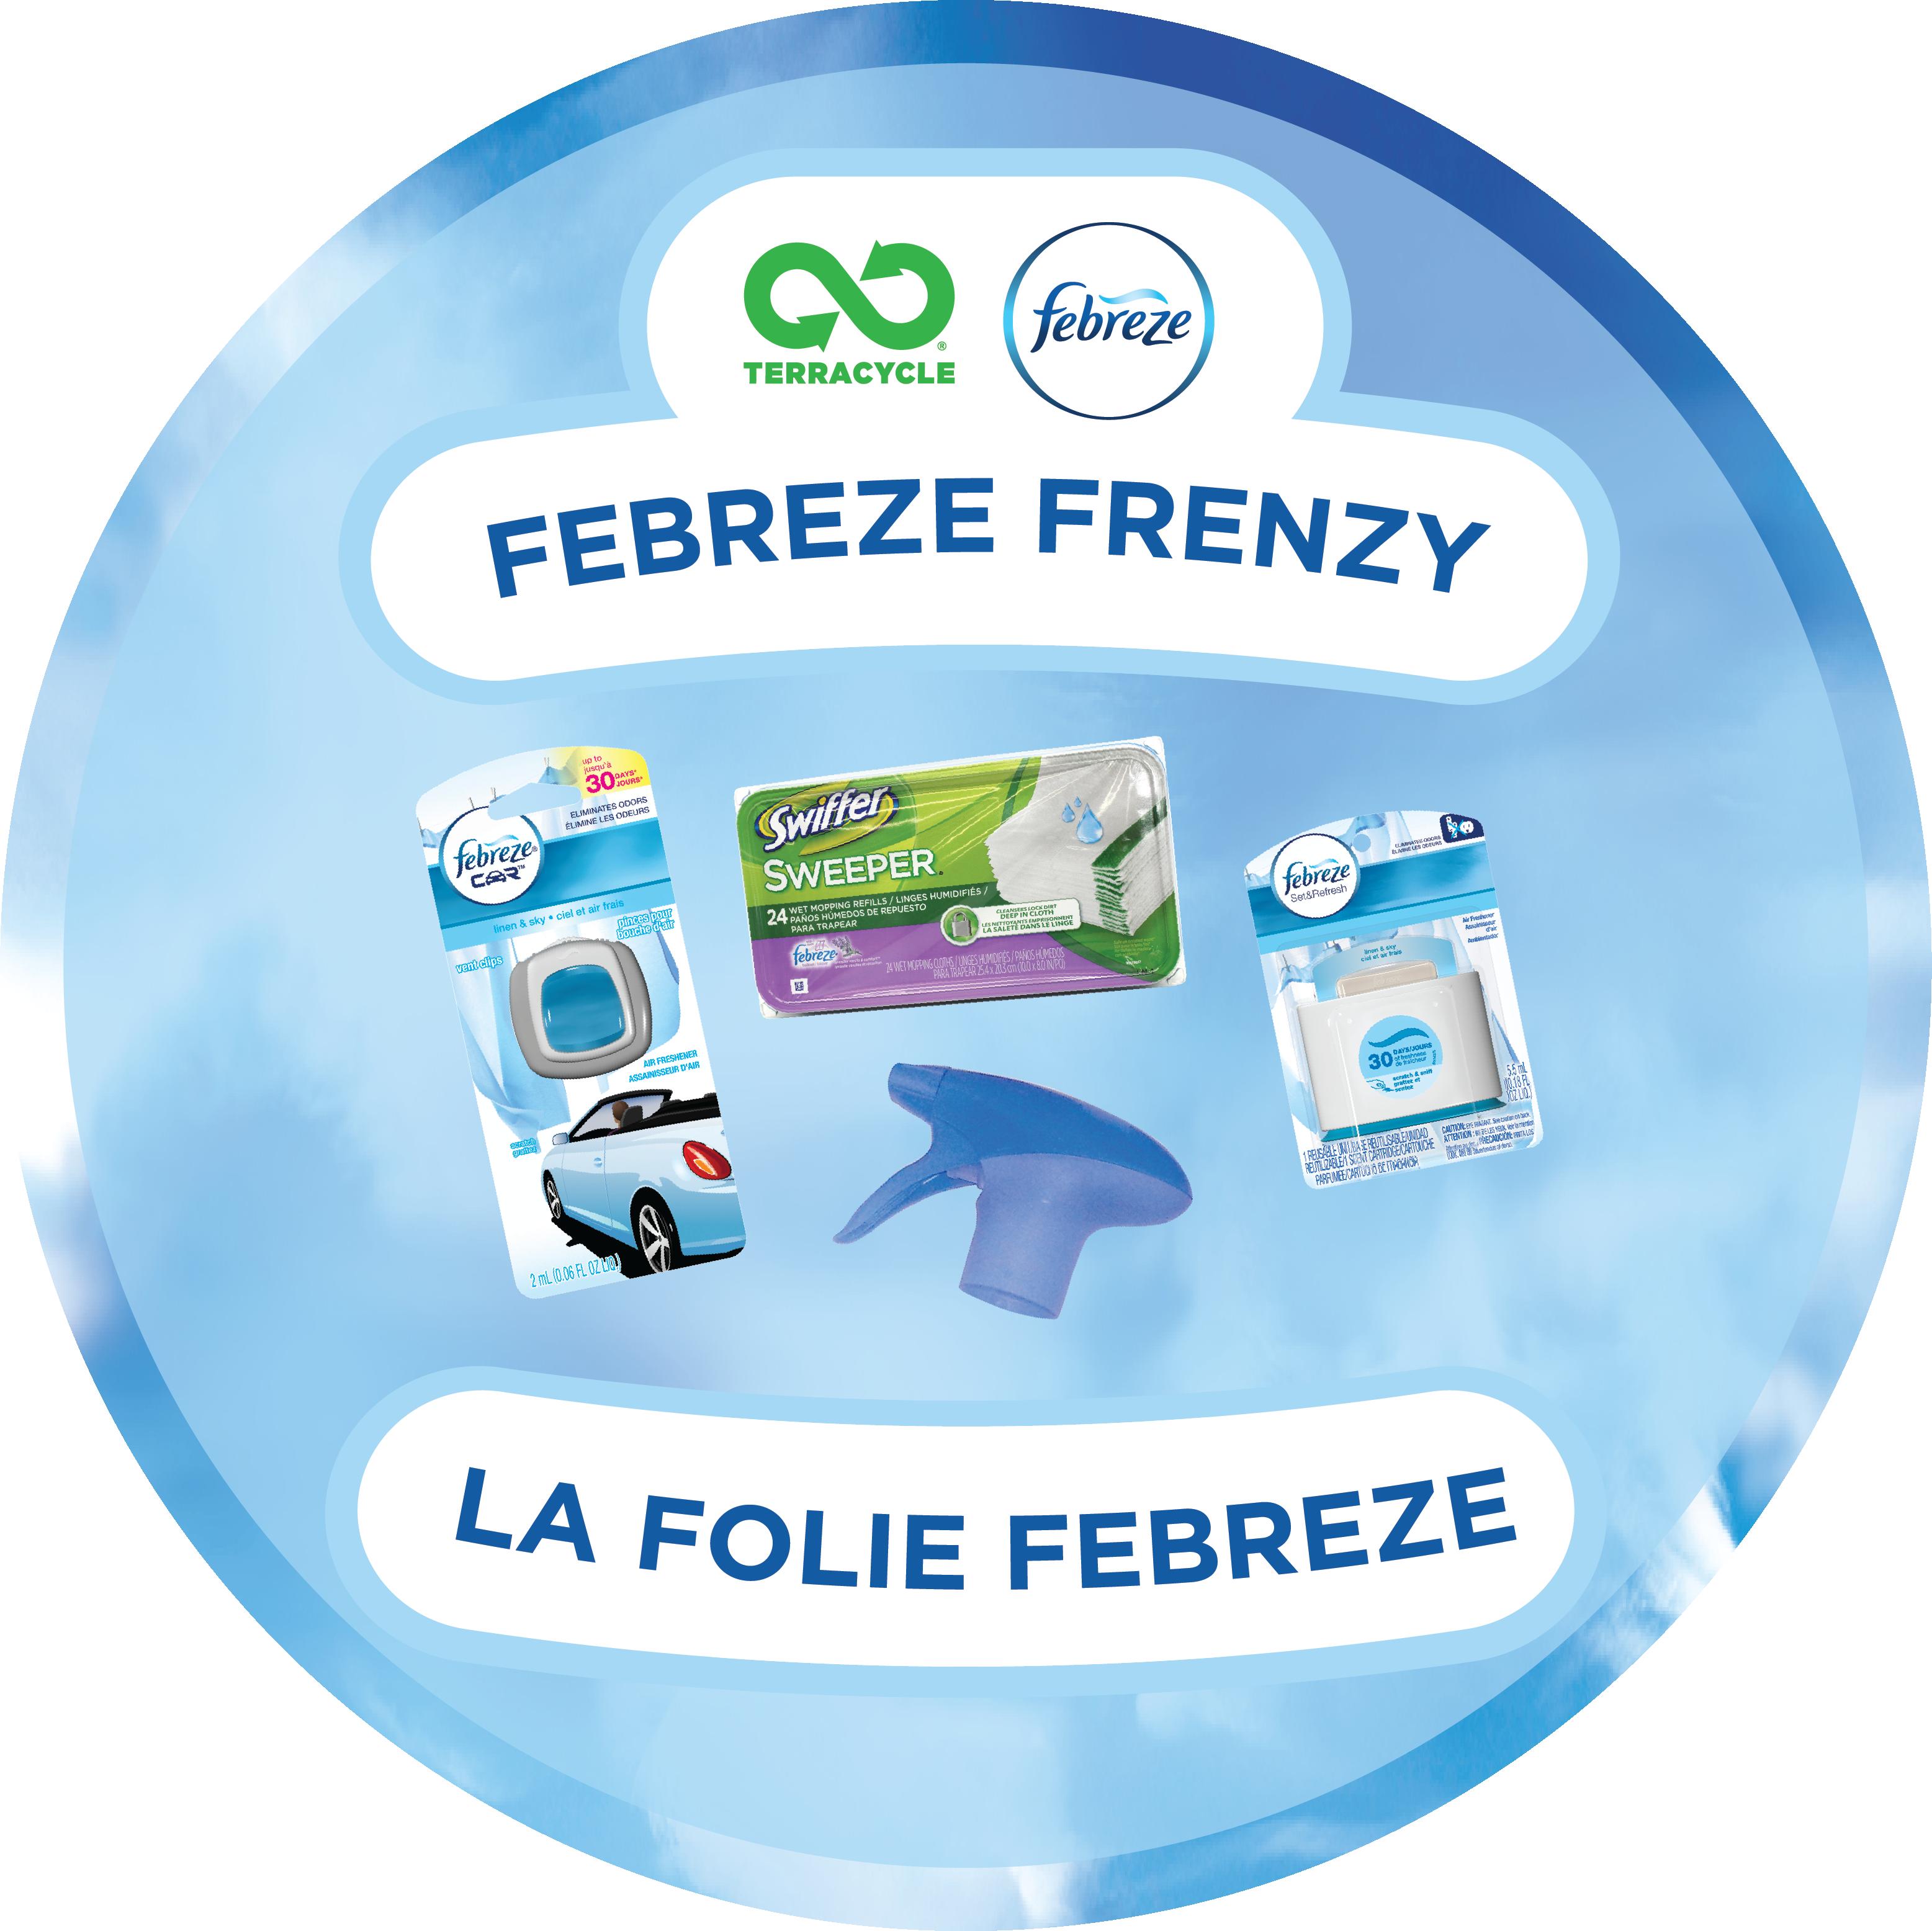 Febreezefrenzy1 06 %281%29